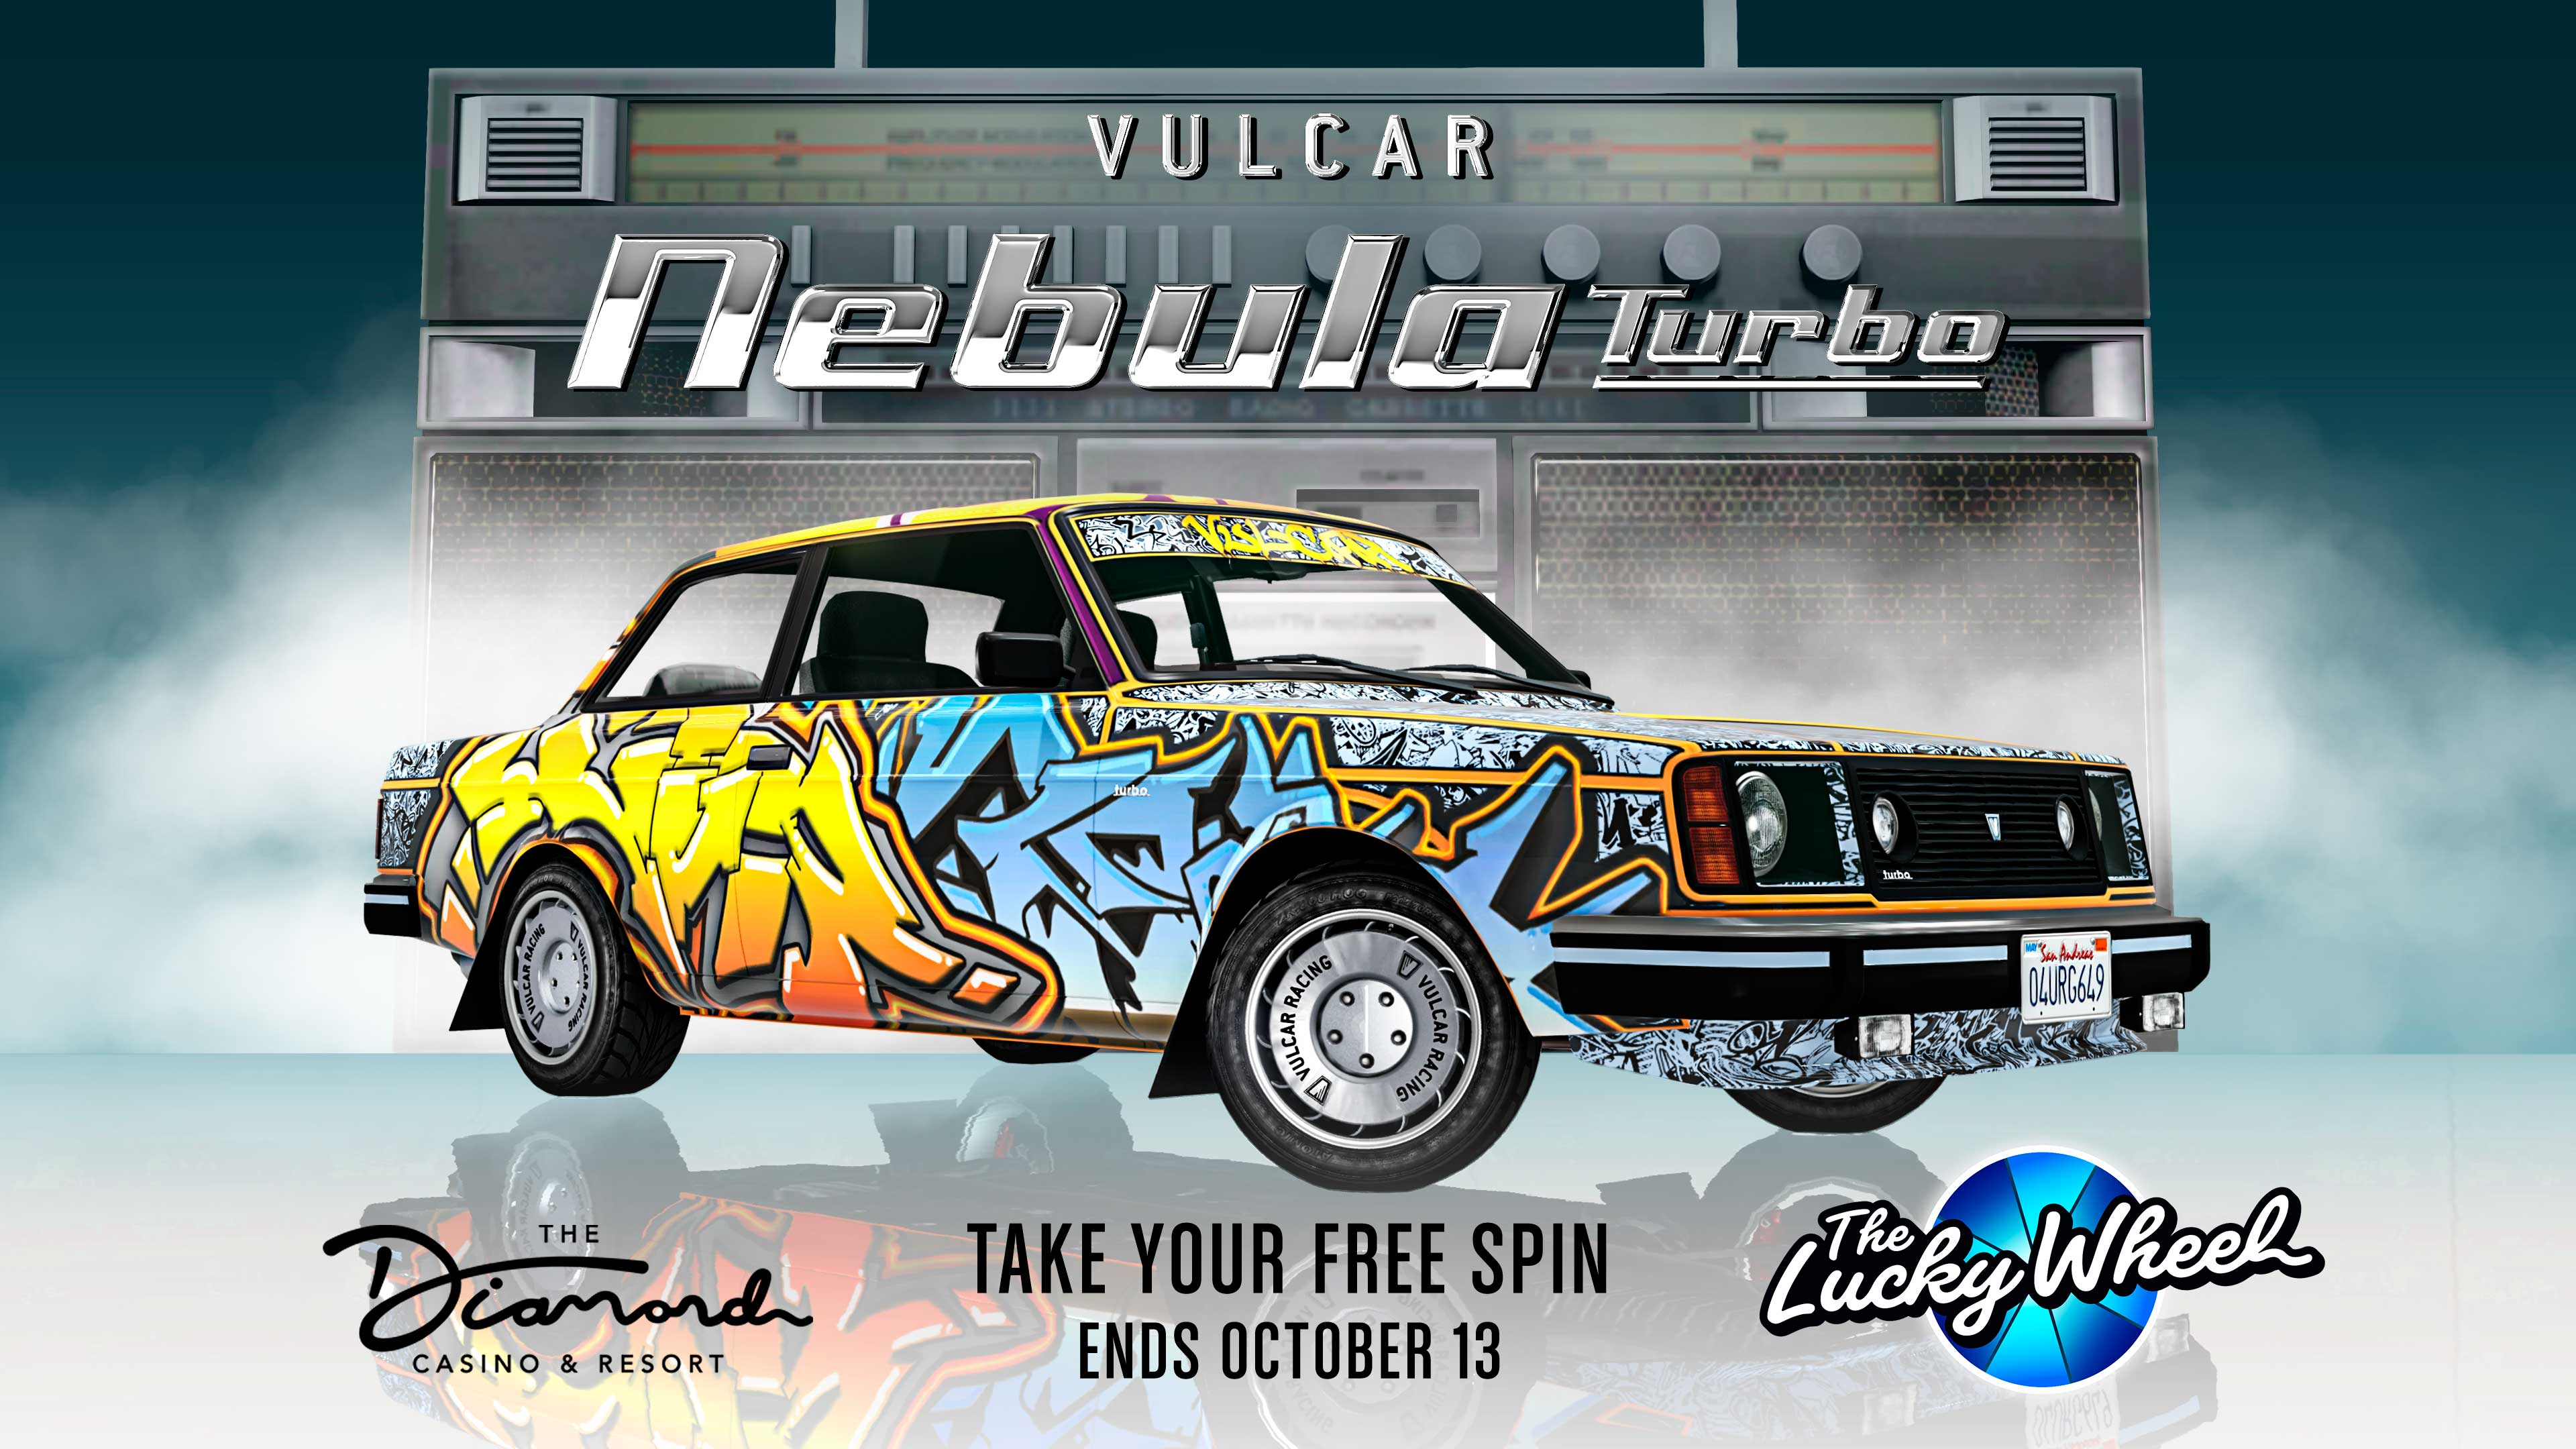 GTA Online Podium Lucky Wheel kocsi: Vulcar Nebula Turbo